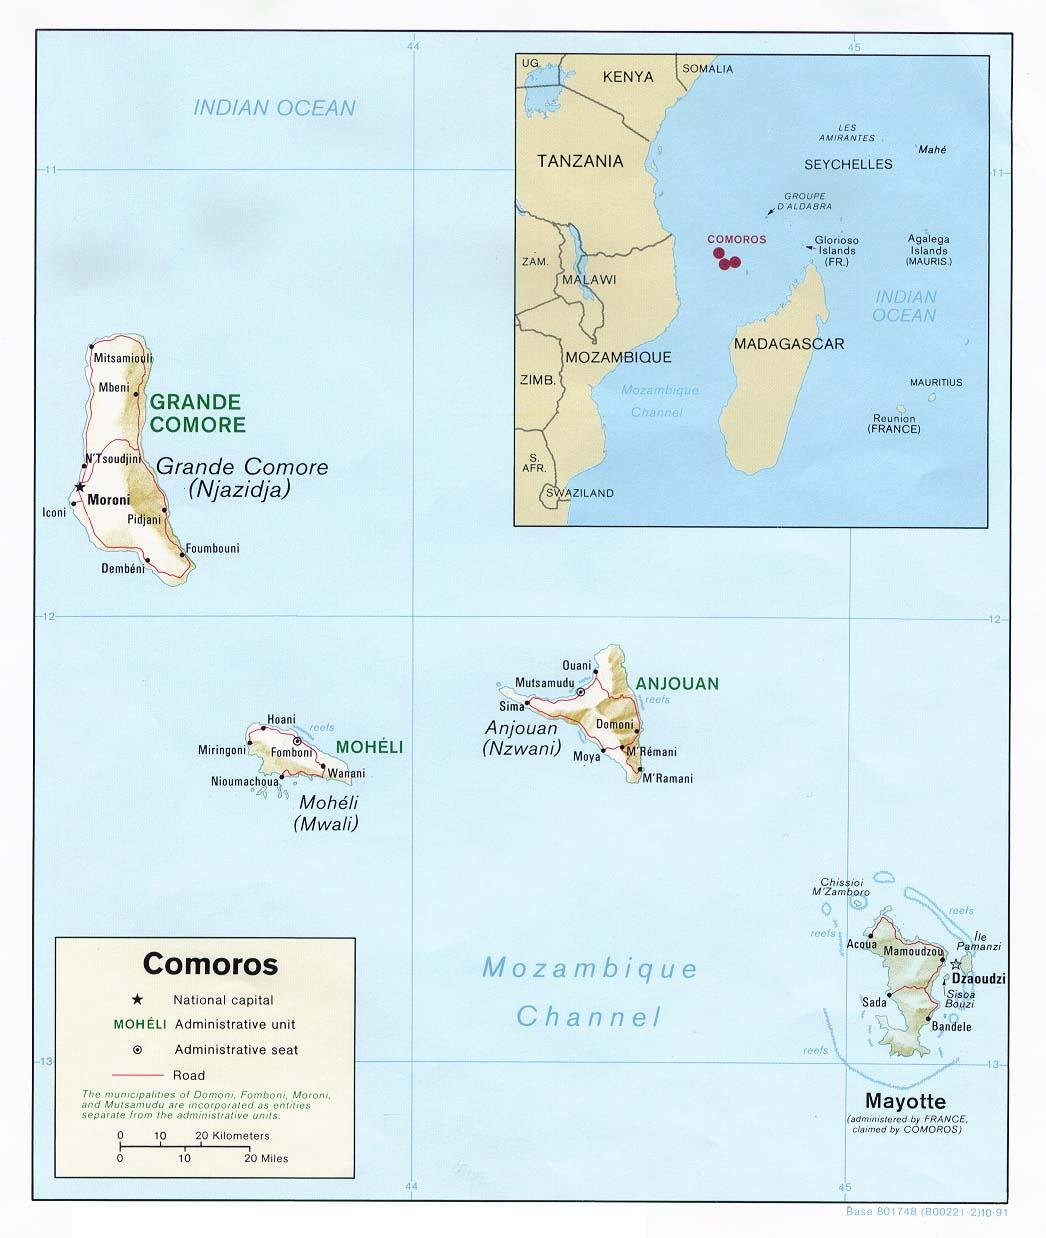 Image:Comoros rel91